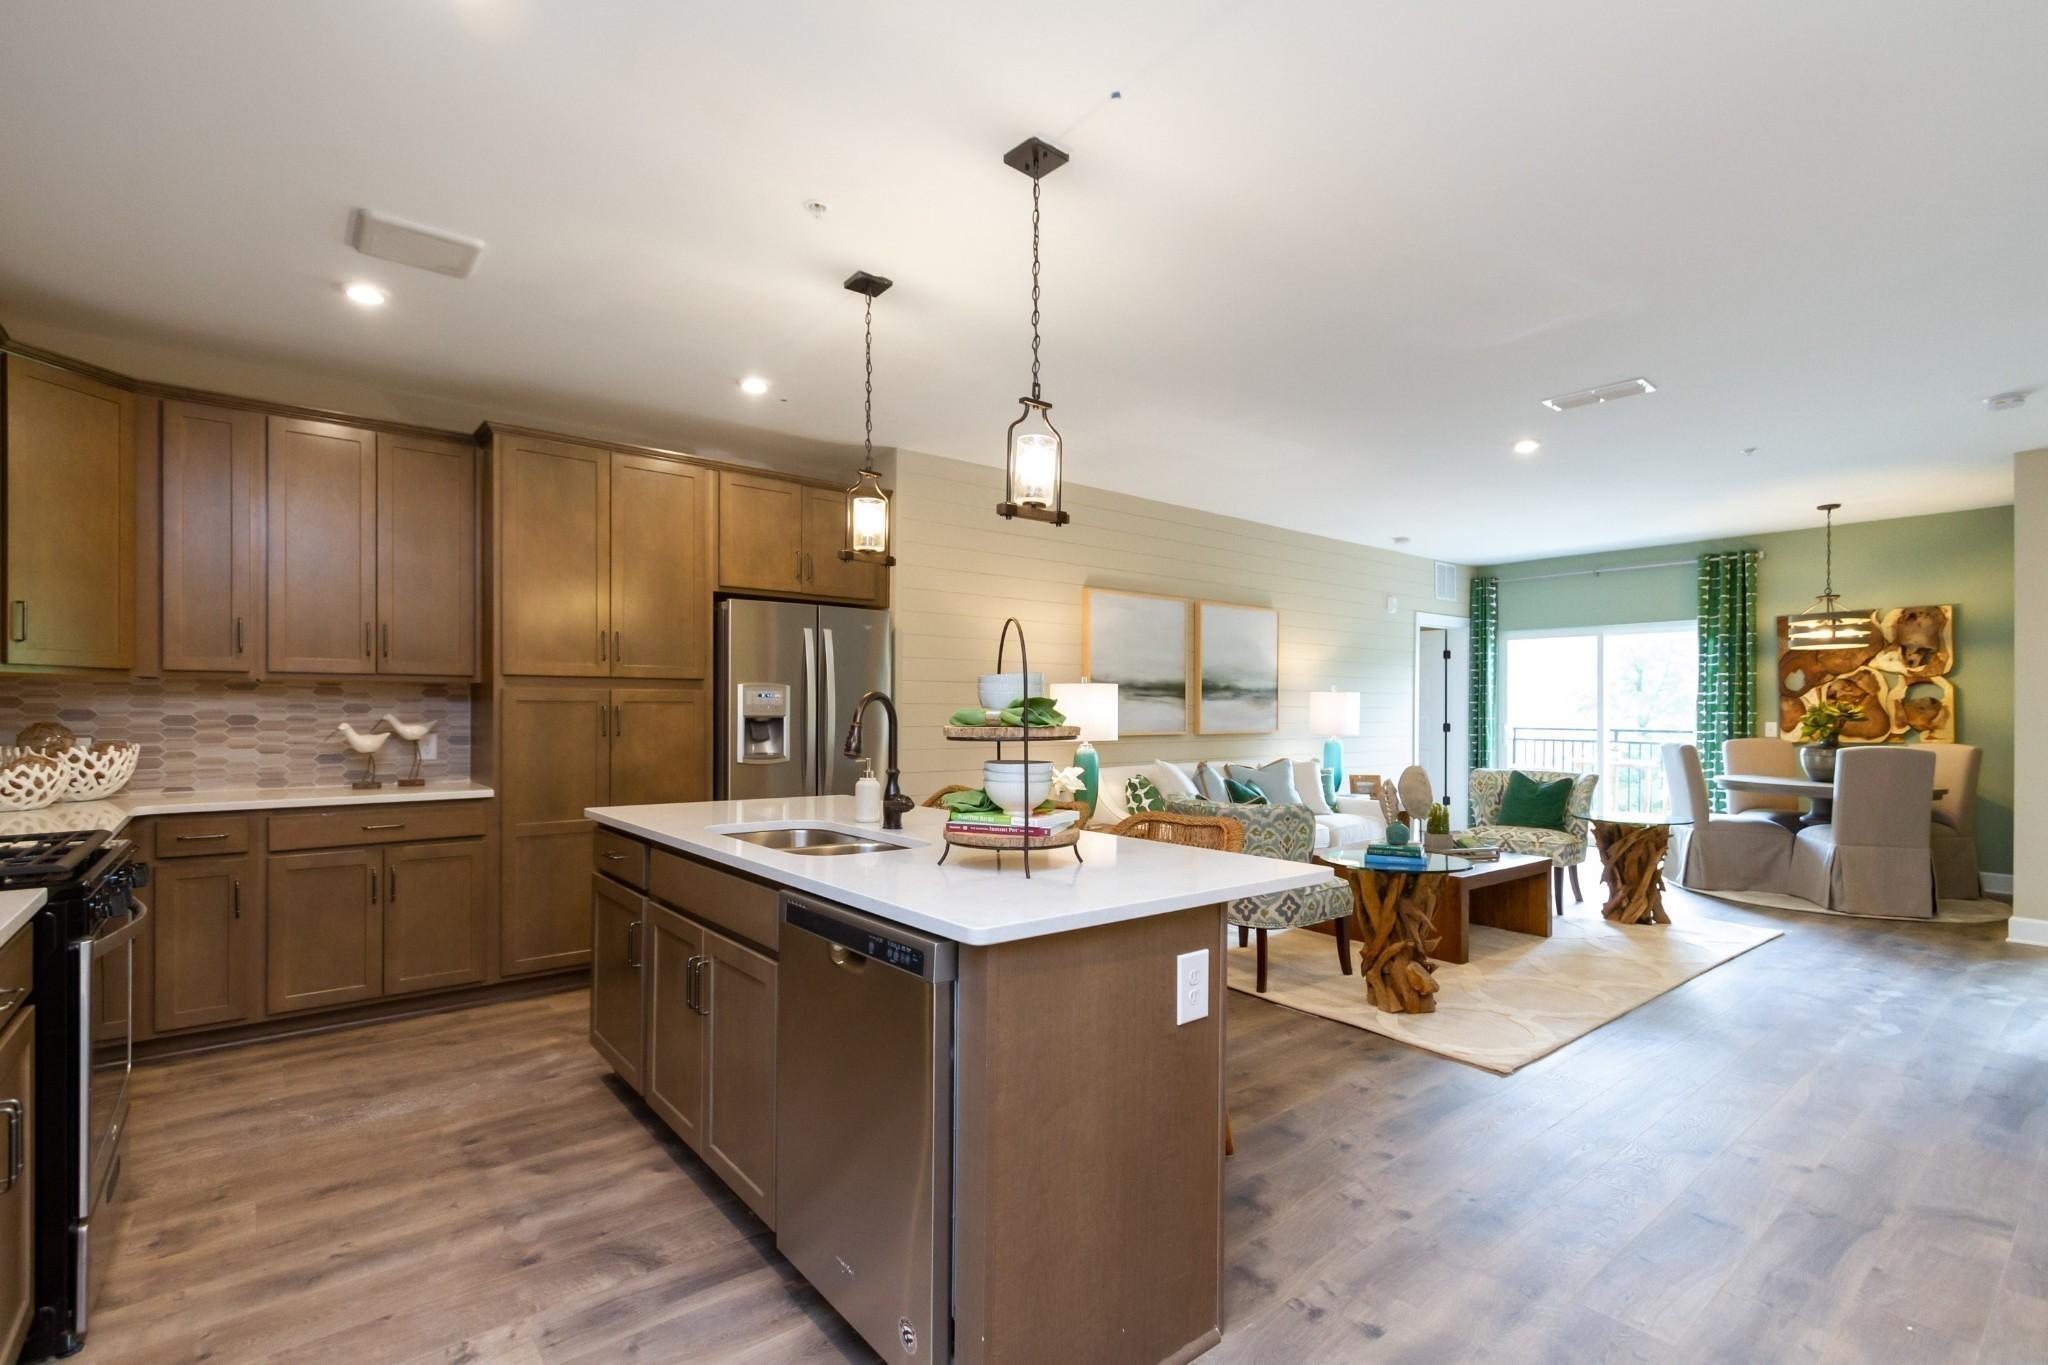 141 Saundersville Road #2405 Property Photo - Hendersonville, TN real estate listing